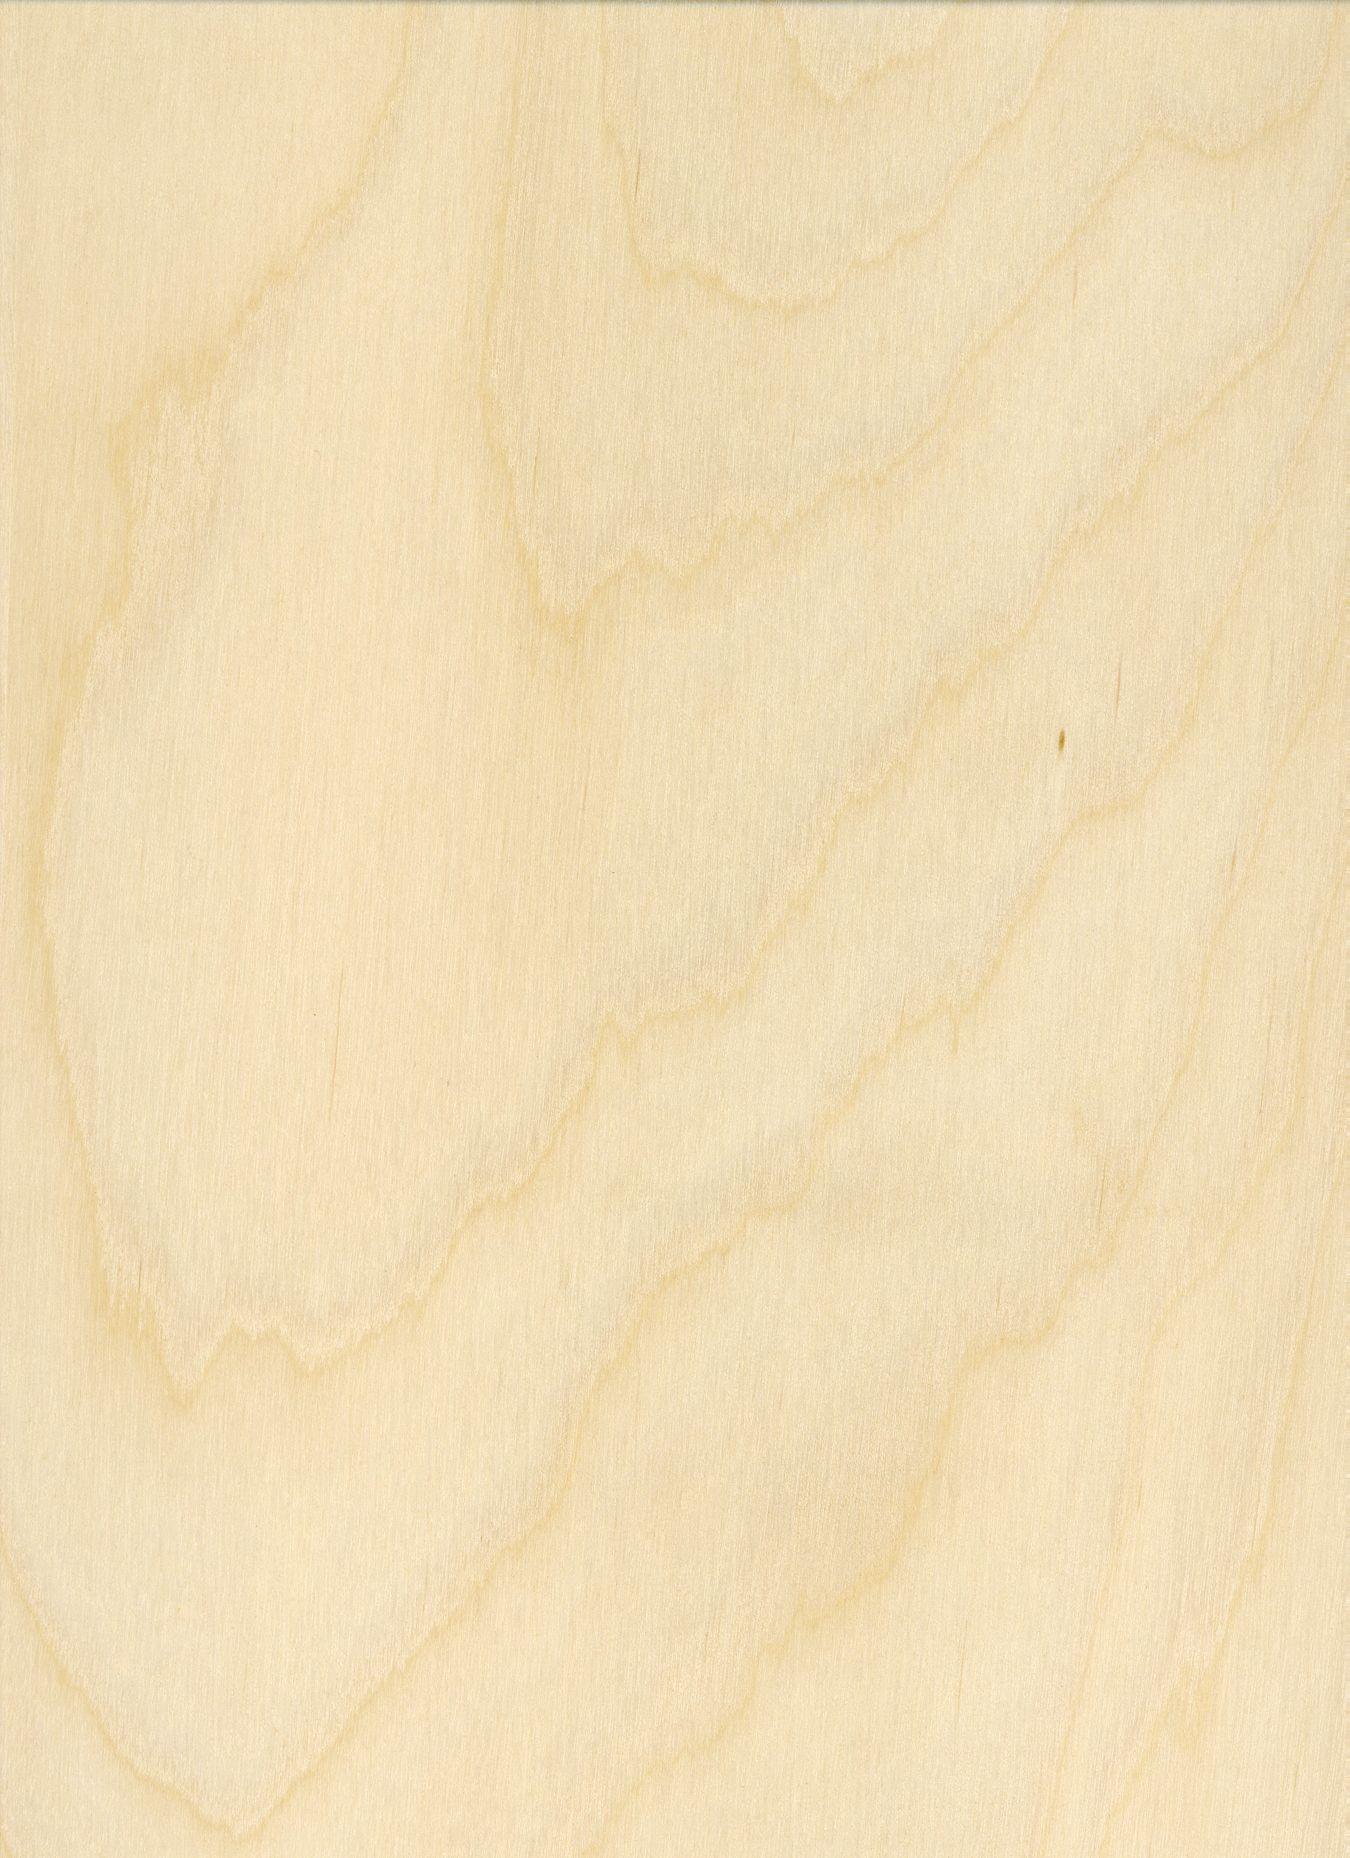 Birchwood ply christmas food pinterest plywood for Berch wood